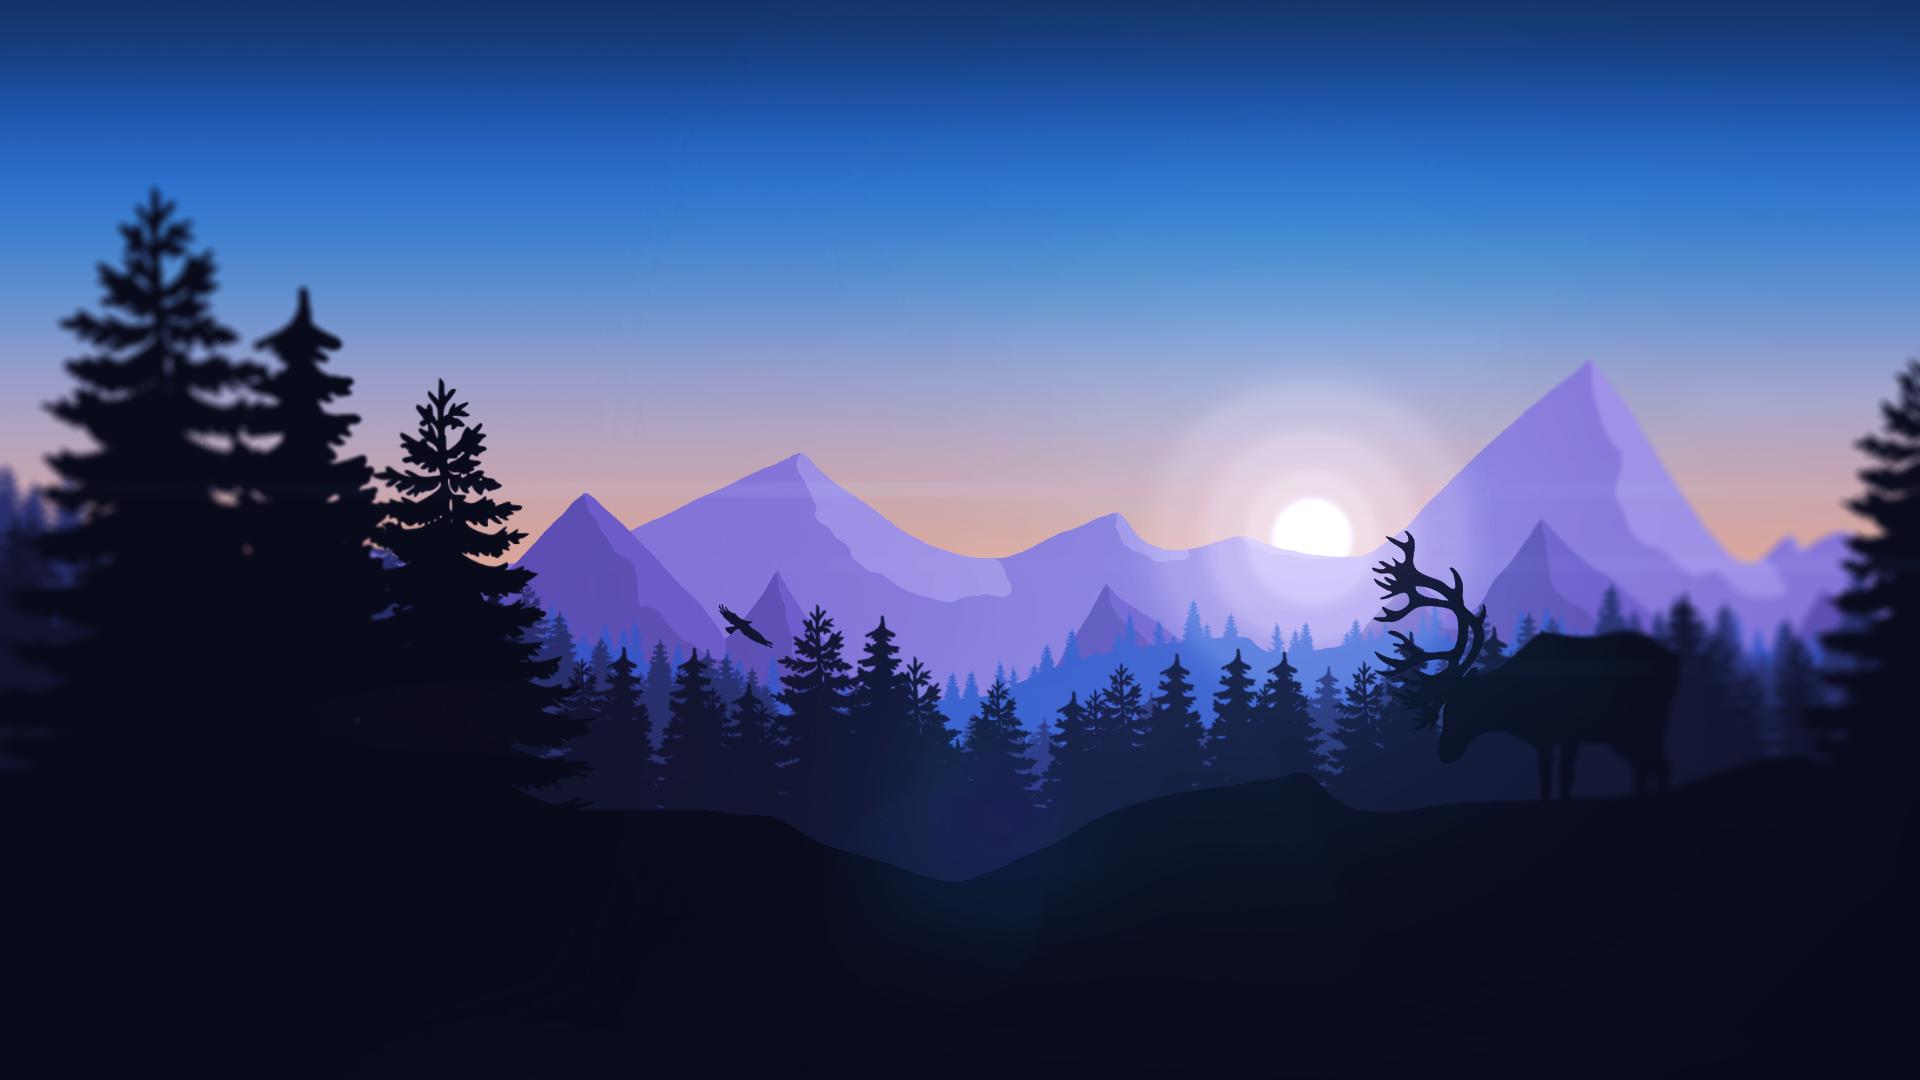 Minimalism Mountain Peak Full Hd Wallpaper: Mountain HD Wallpaper